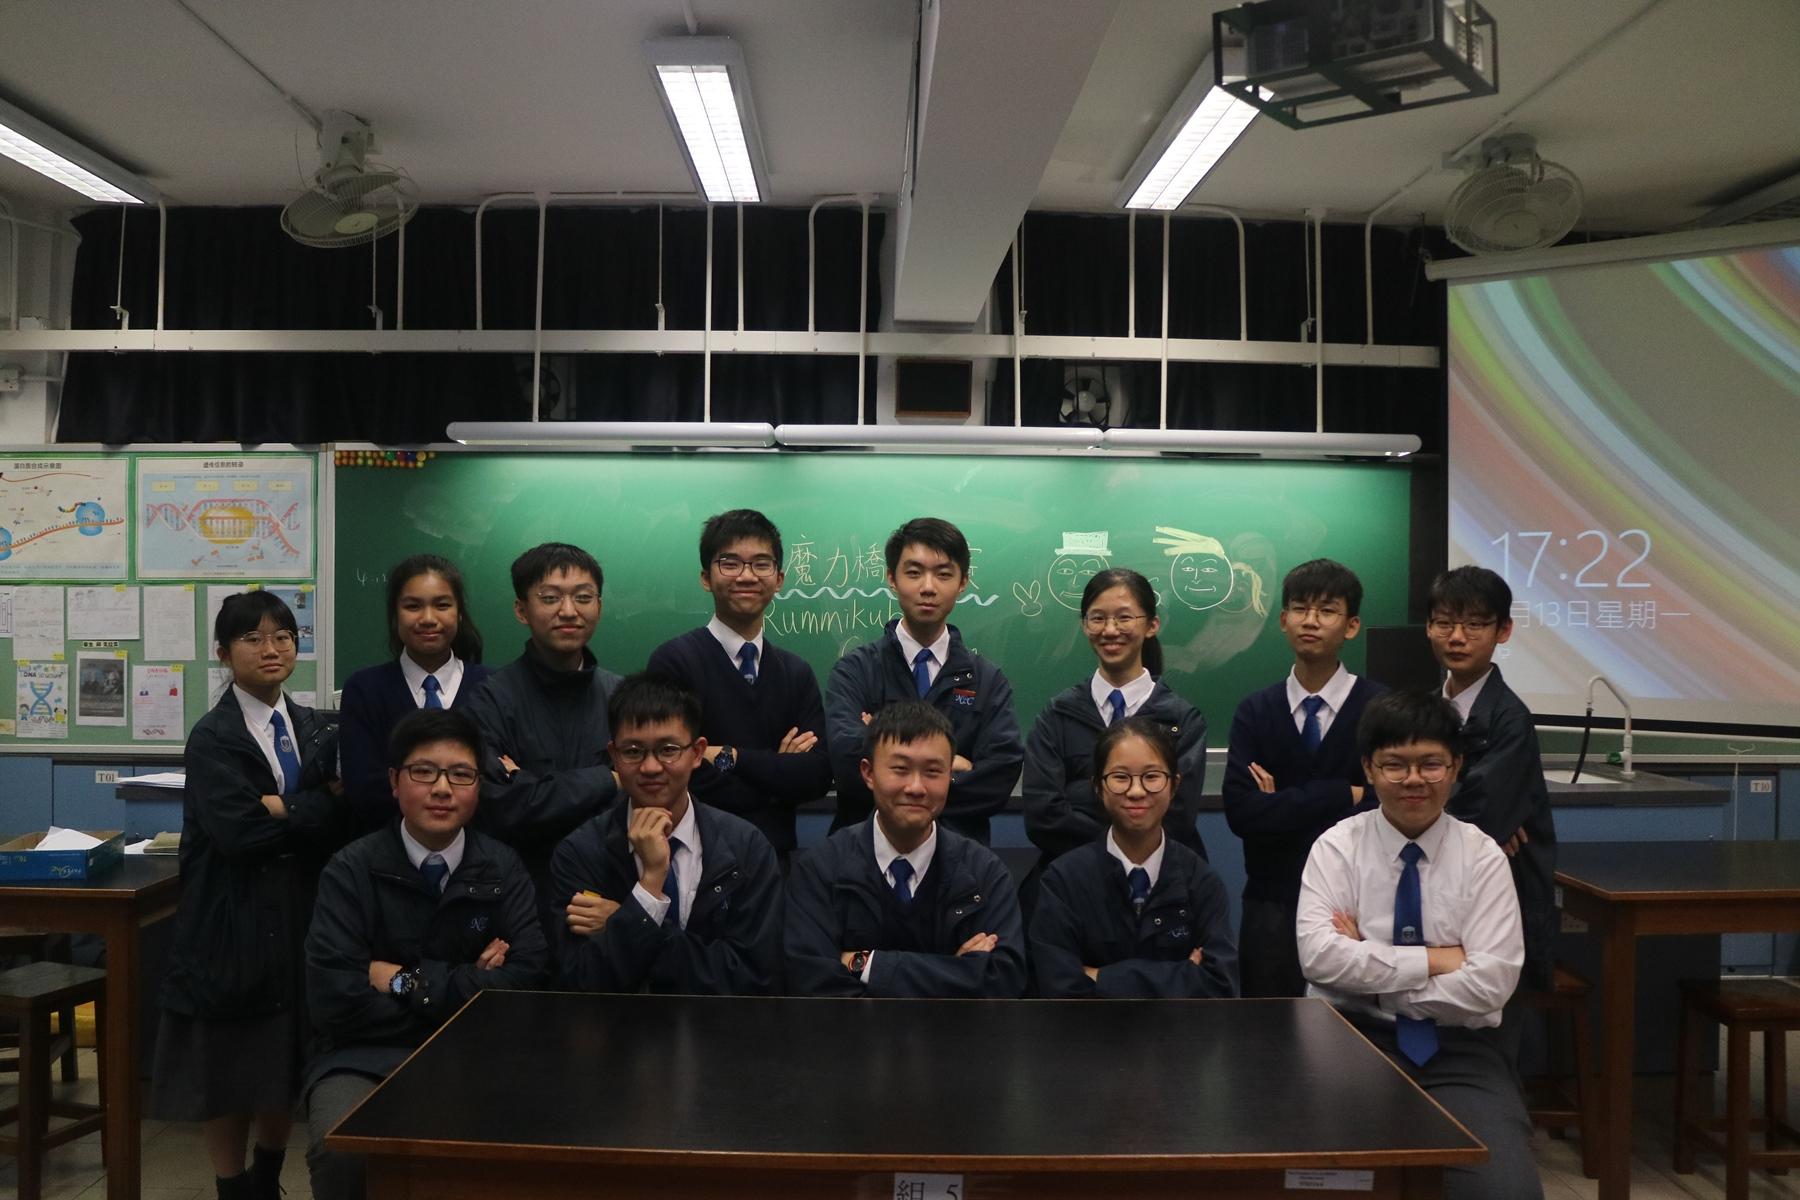 http://npc.edu.hk/sites/default/files/img_8914.jpg